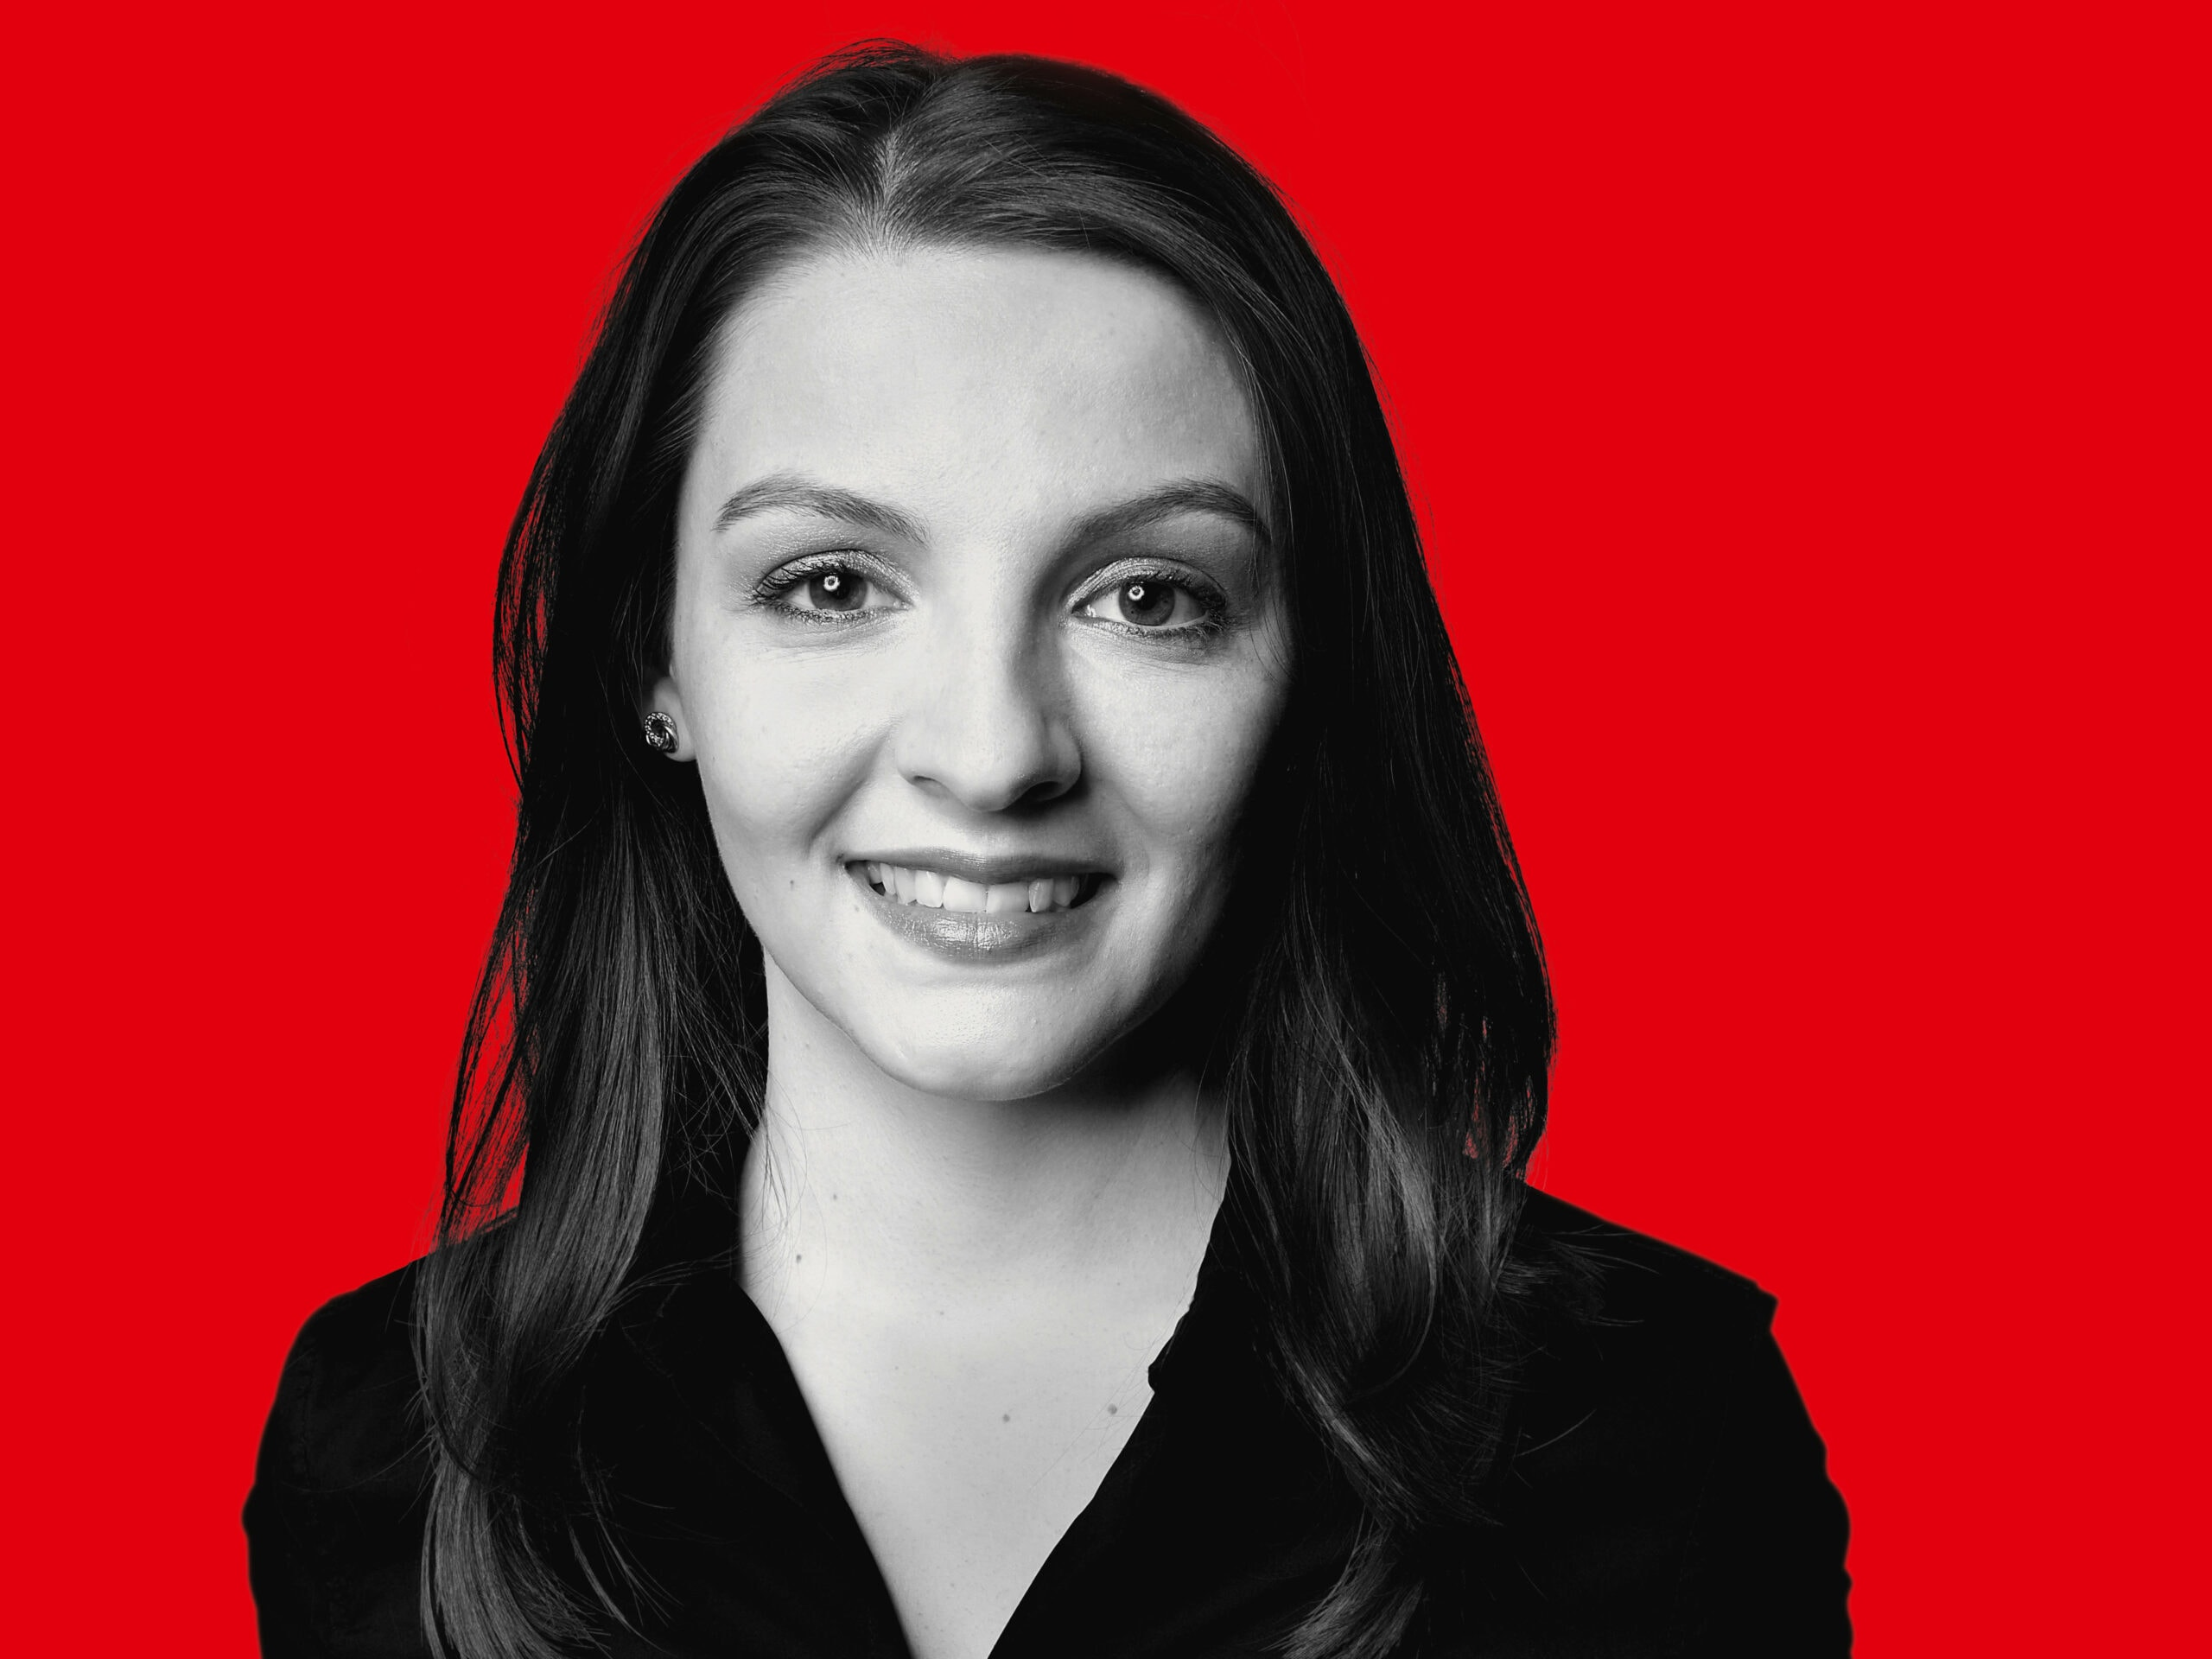 Ana-Maria Tresnea